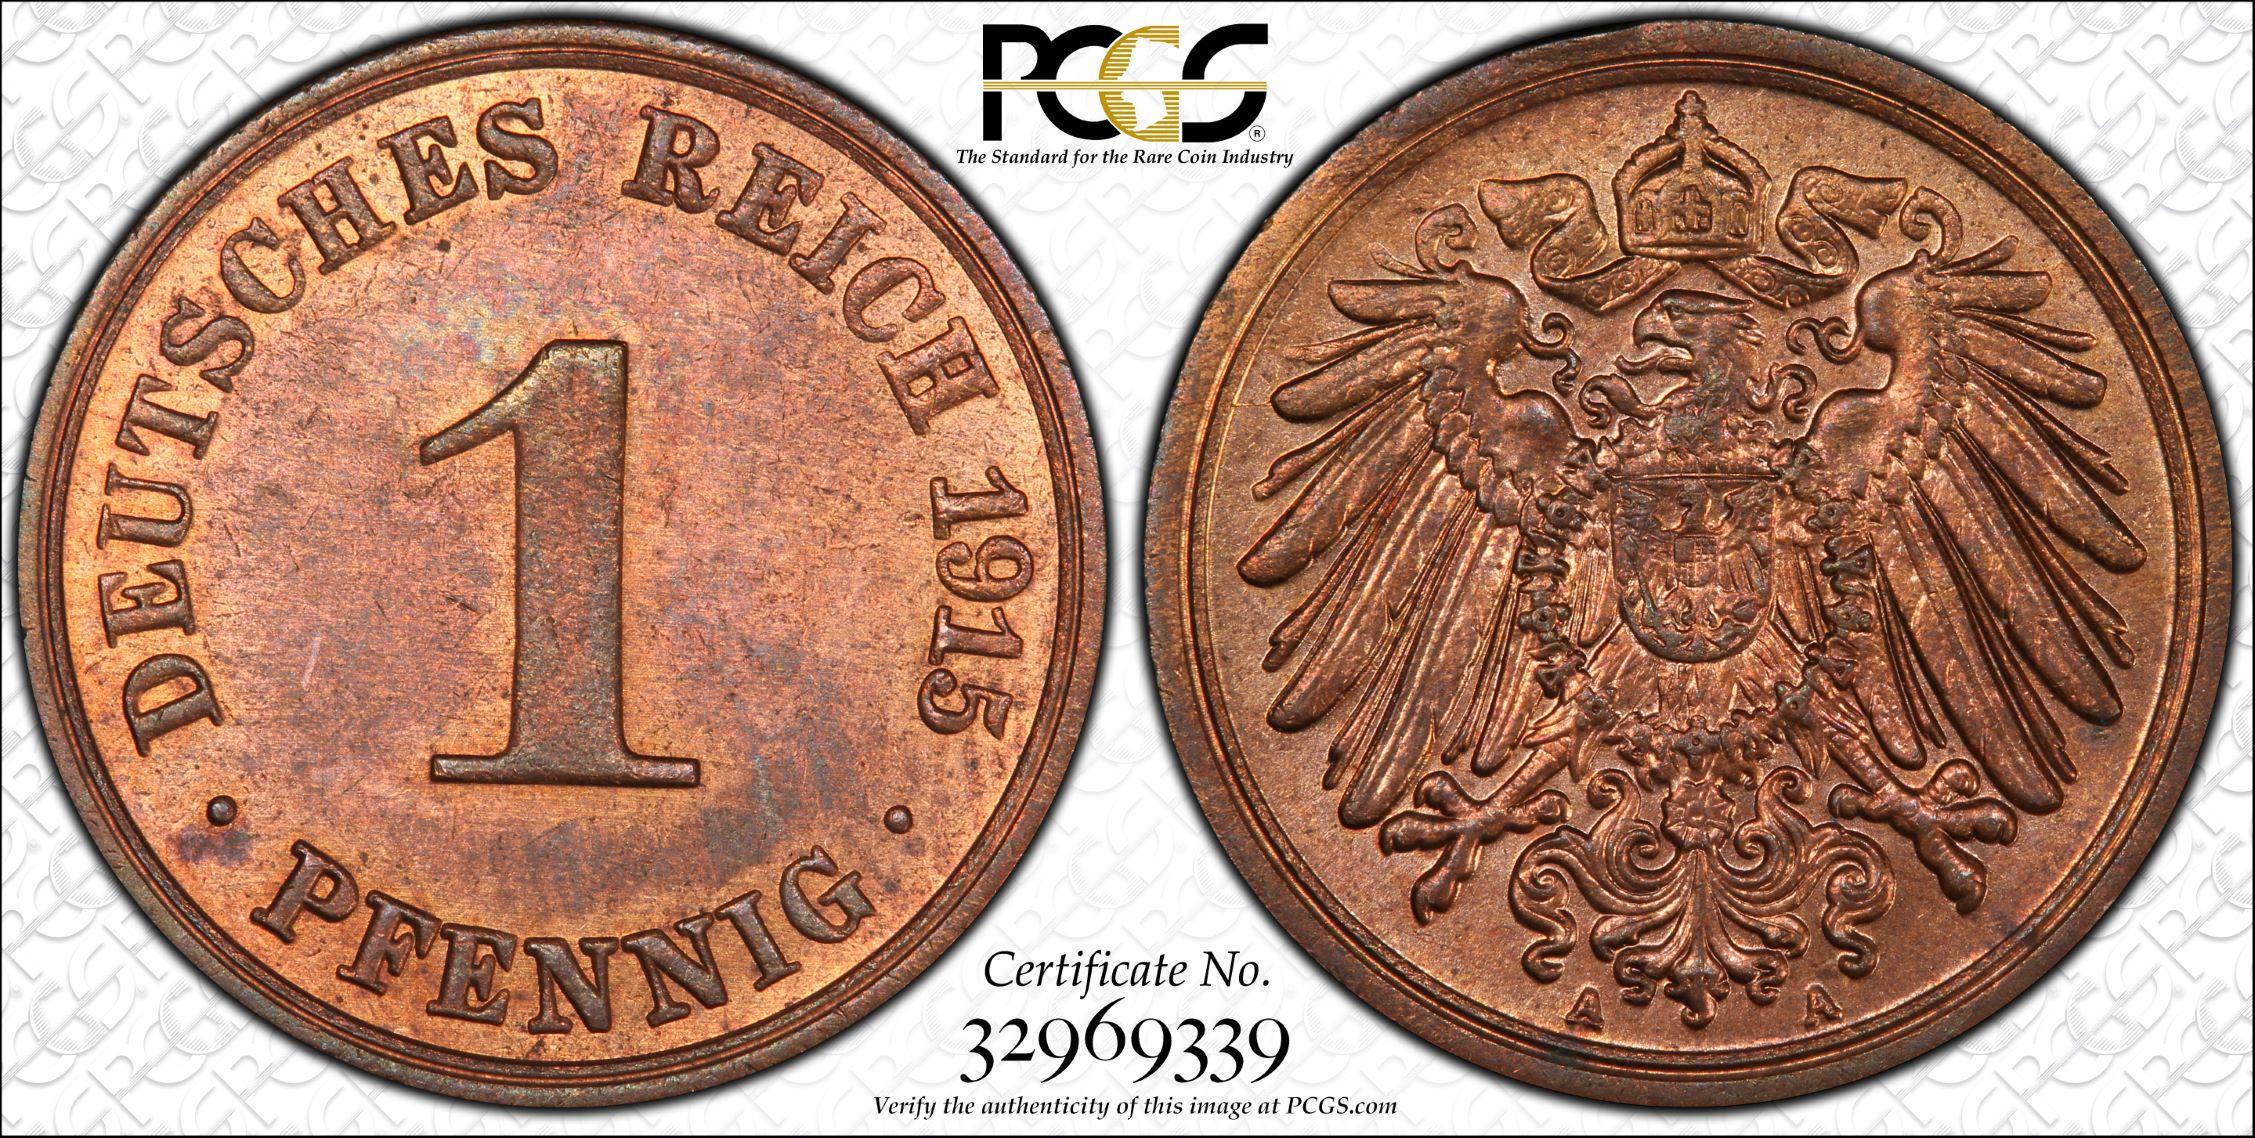 GERMANY 1 PFENNIG, LARGE EAGLE (1890-1916)